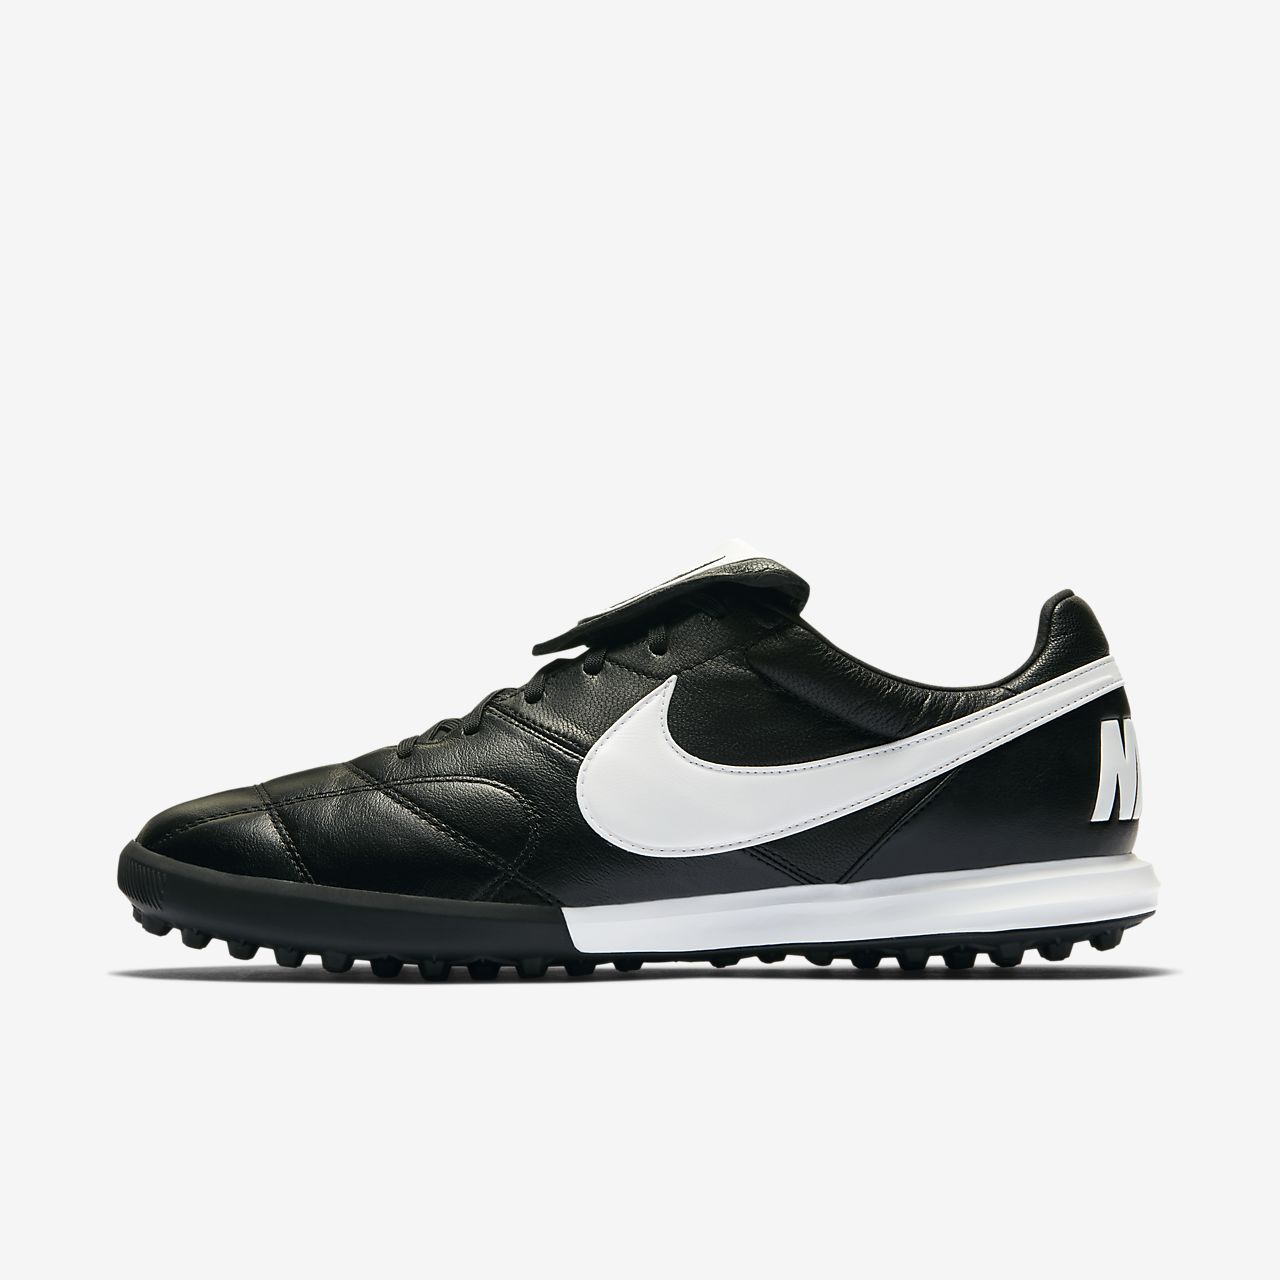 Nike Premier II Turf Football Shoe